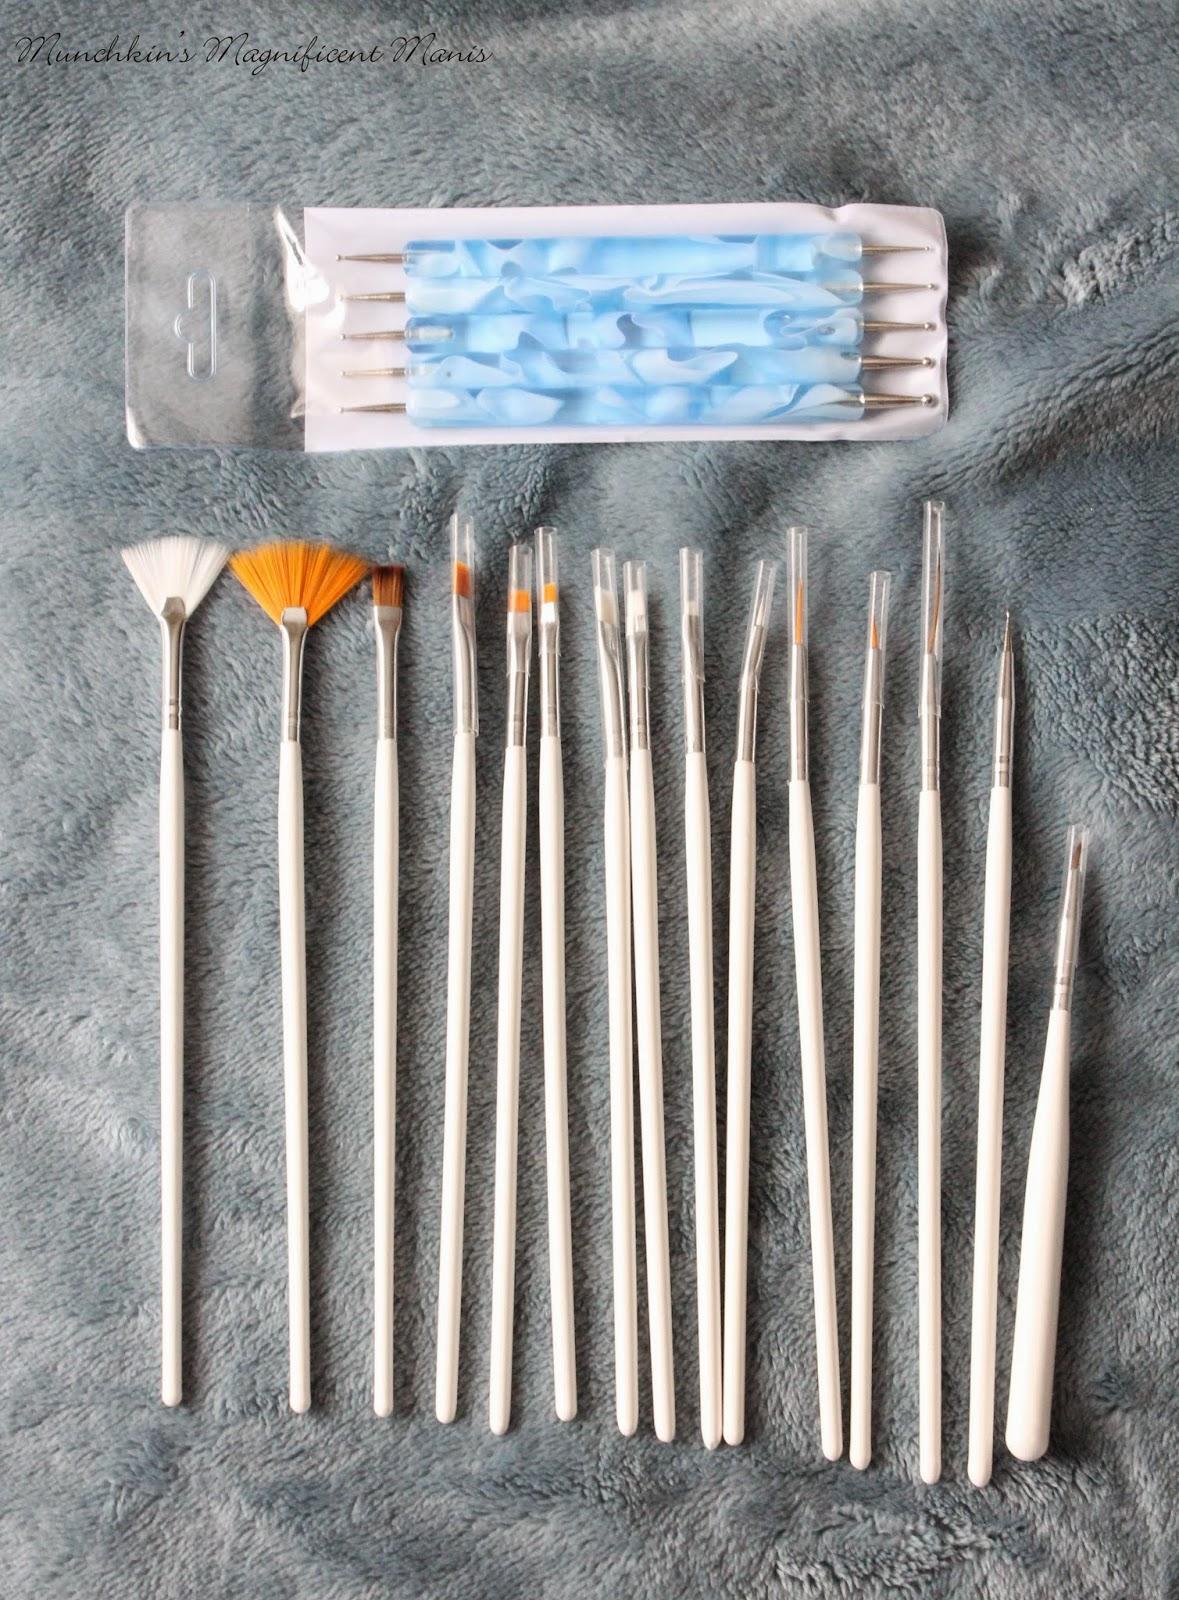 15pc nail art brushes and dotting tools